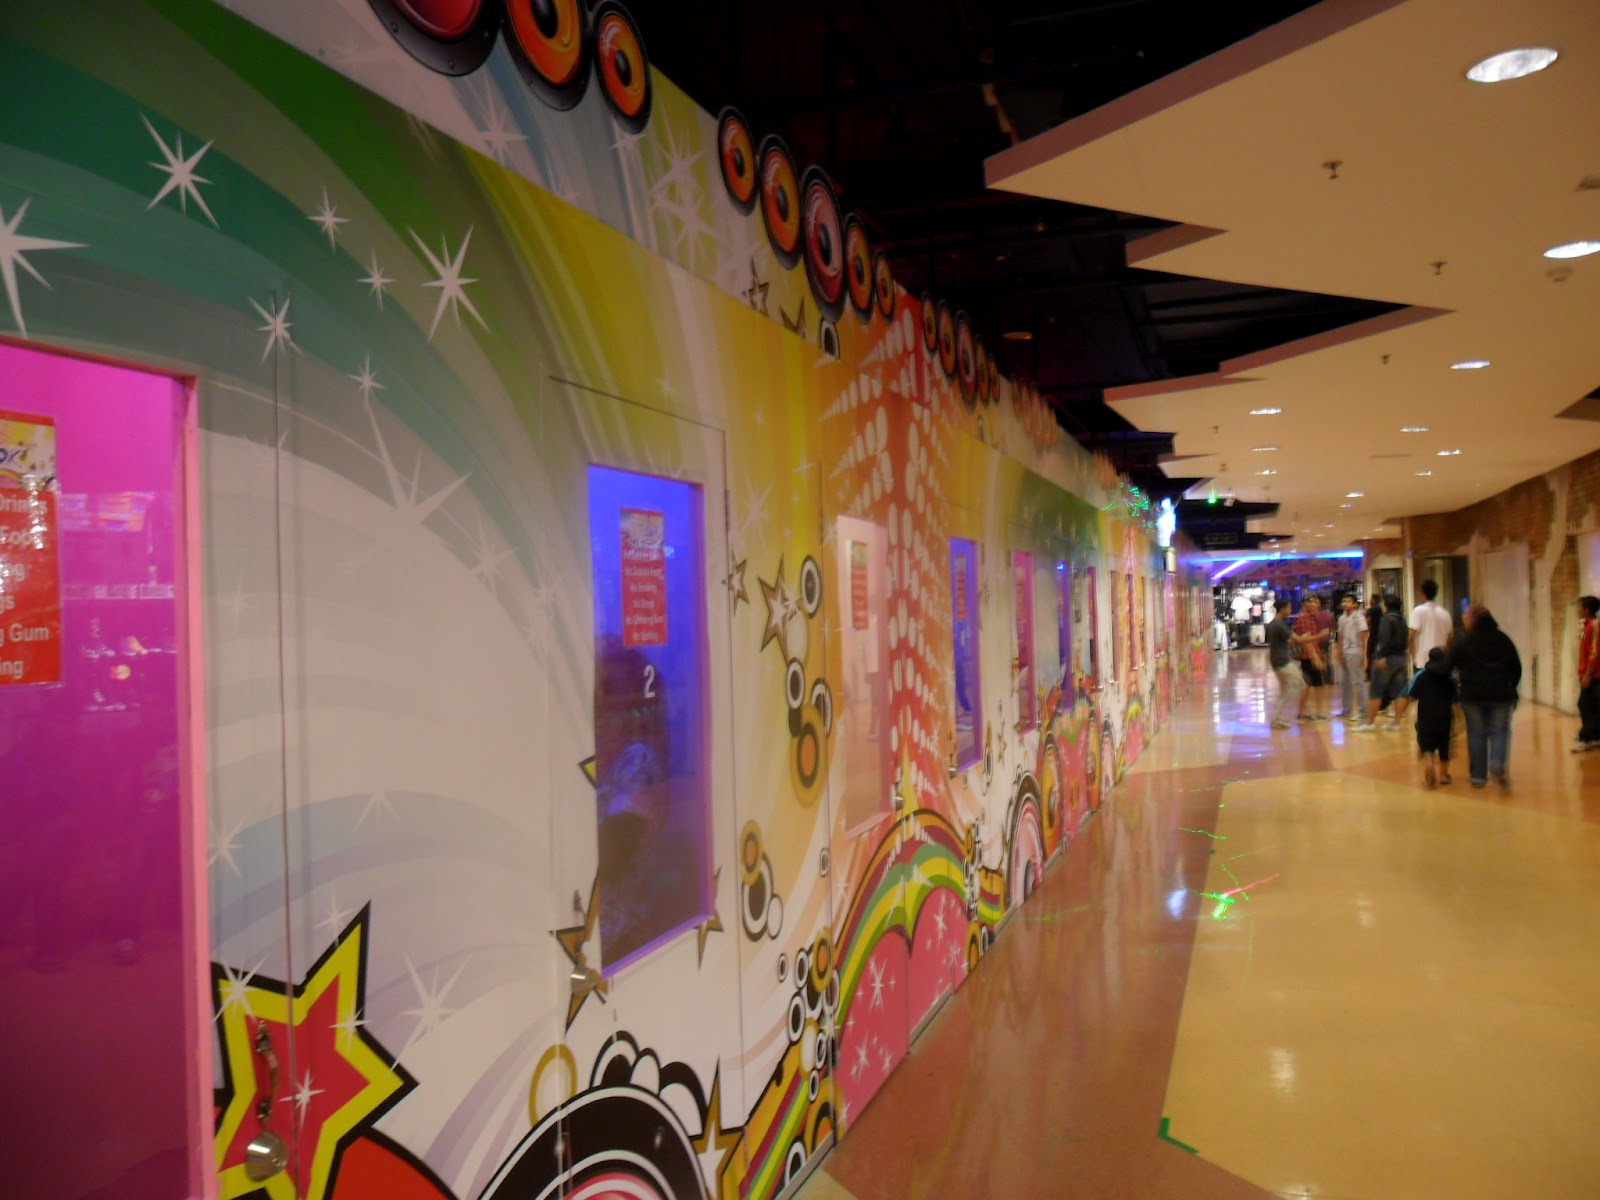 Expat Abroad: Karaoke Booths in Kuala Lumpur, Berjaya Times